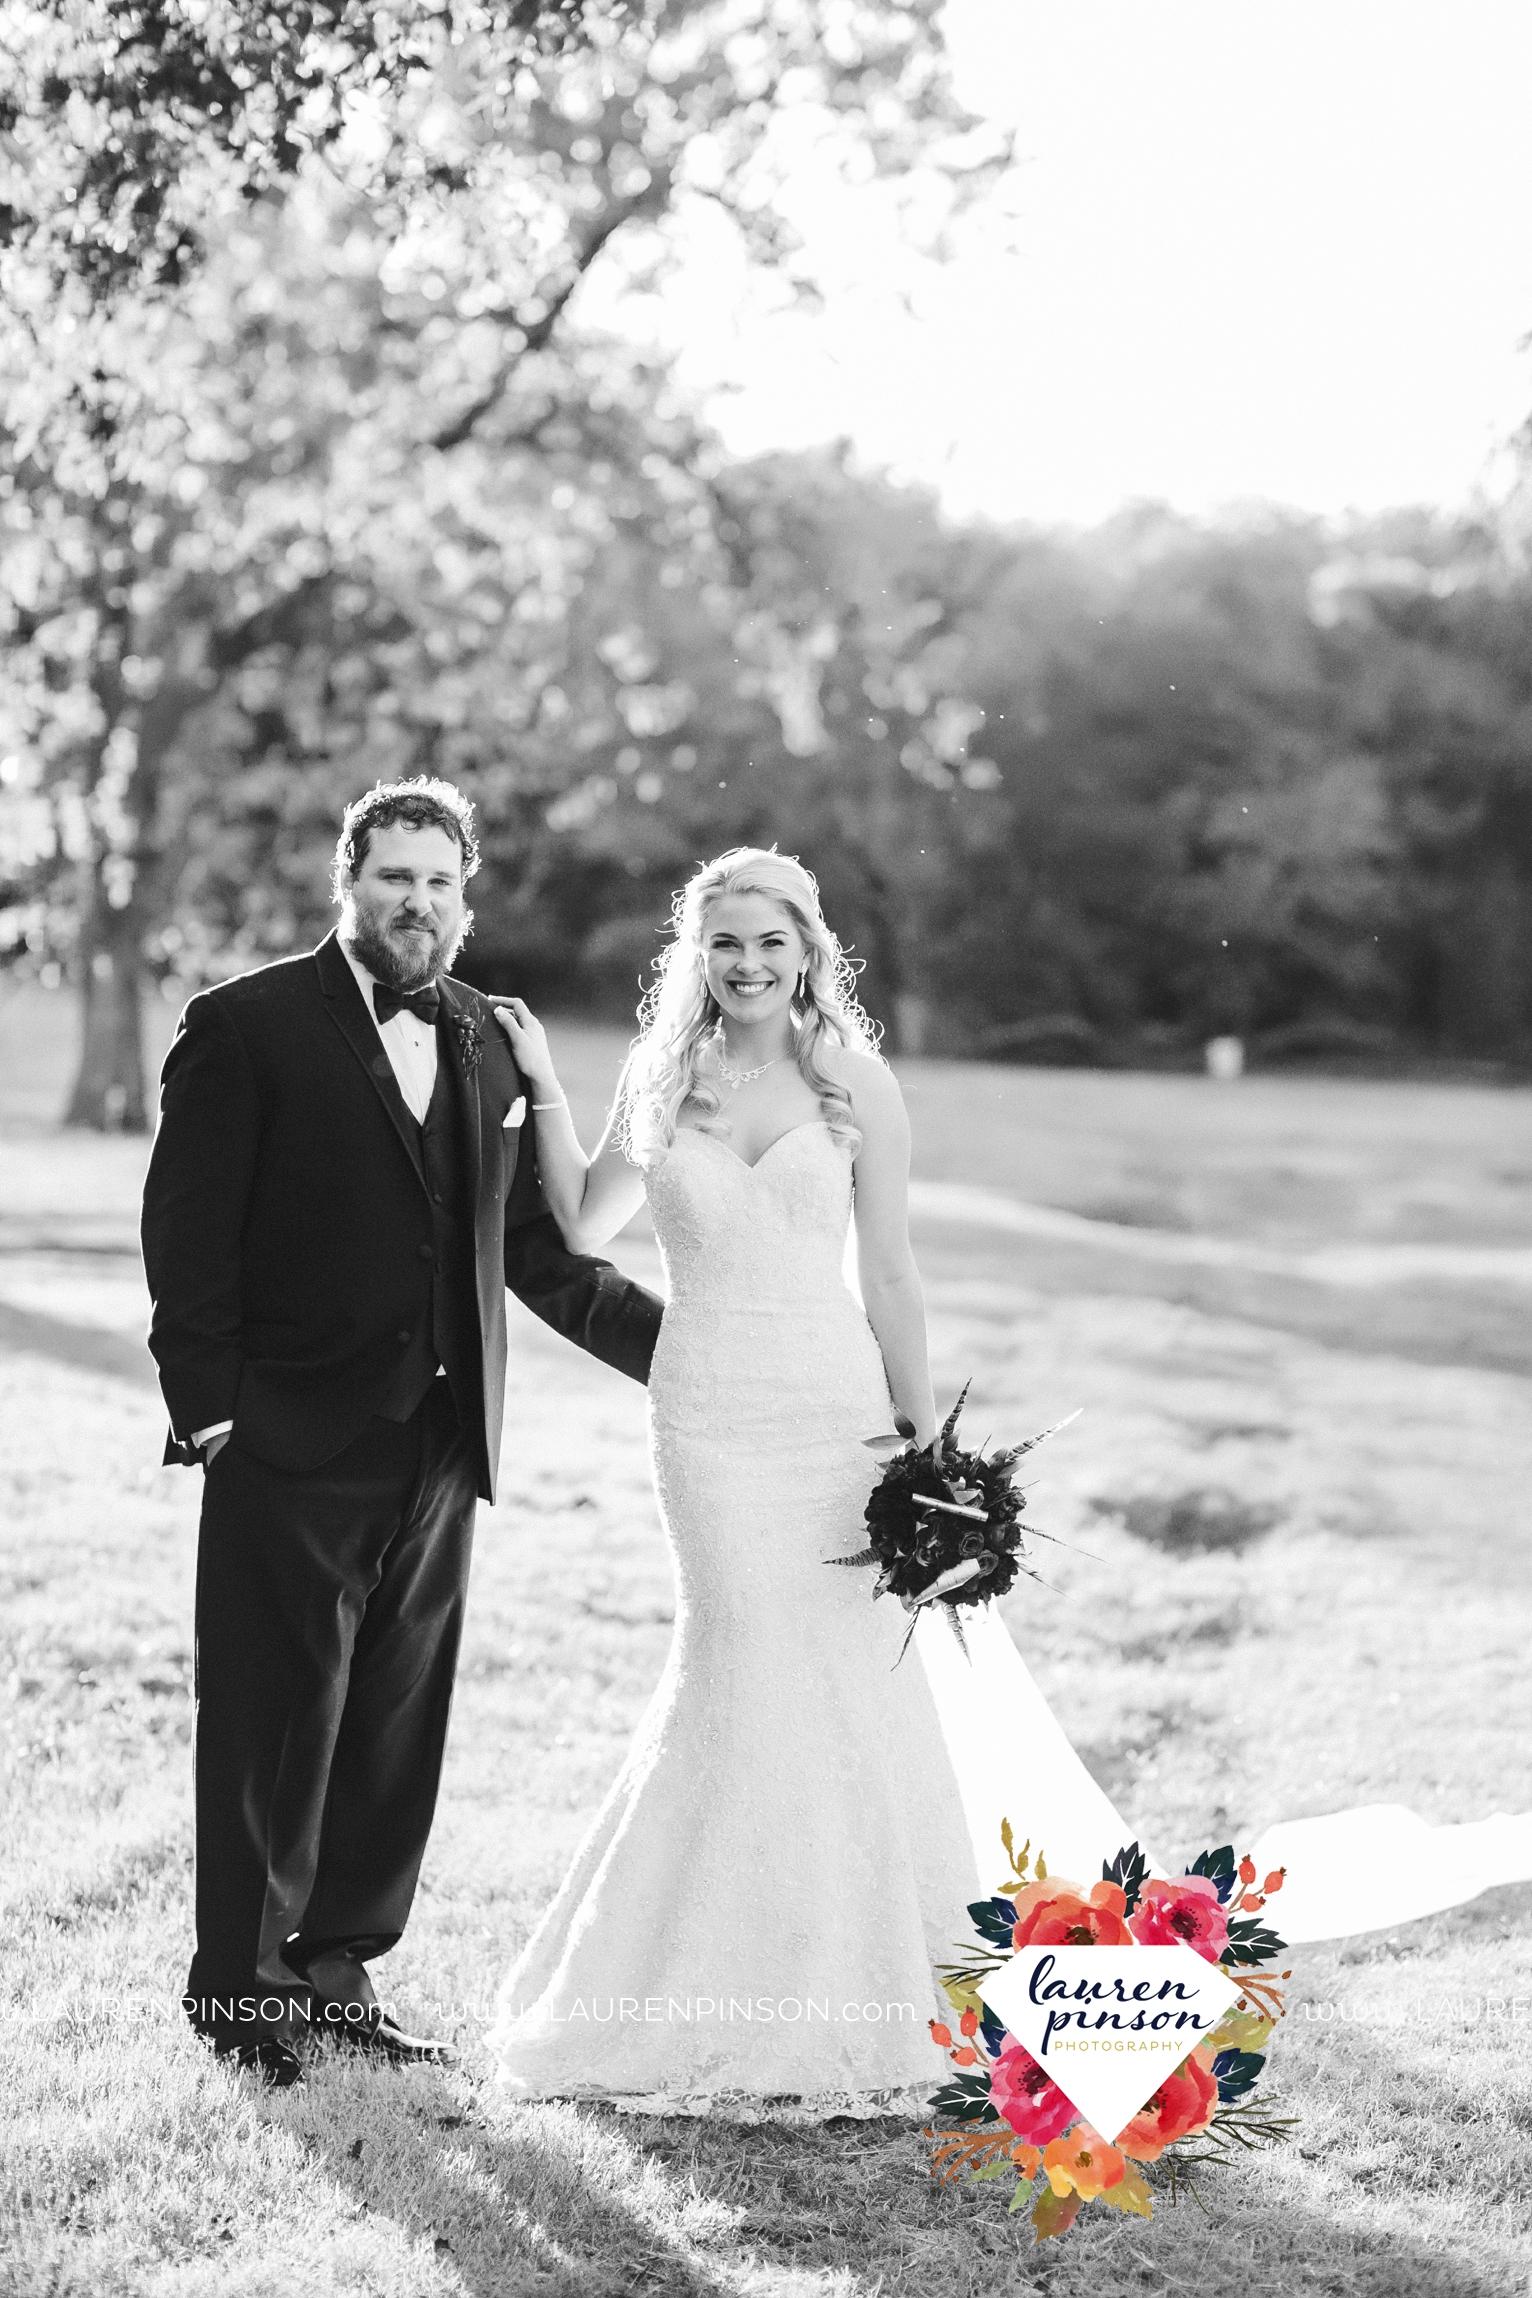 rustic-wichita-falls-texas-wedding-photographer-gold-glam-mayfield-events-market-street-united-allue-bridals-fall_1764.jpg